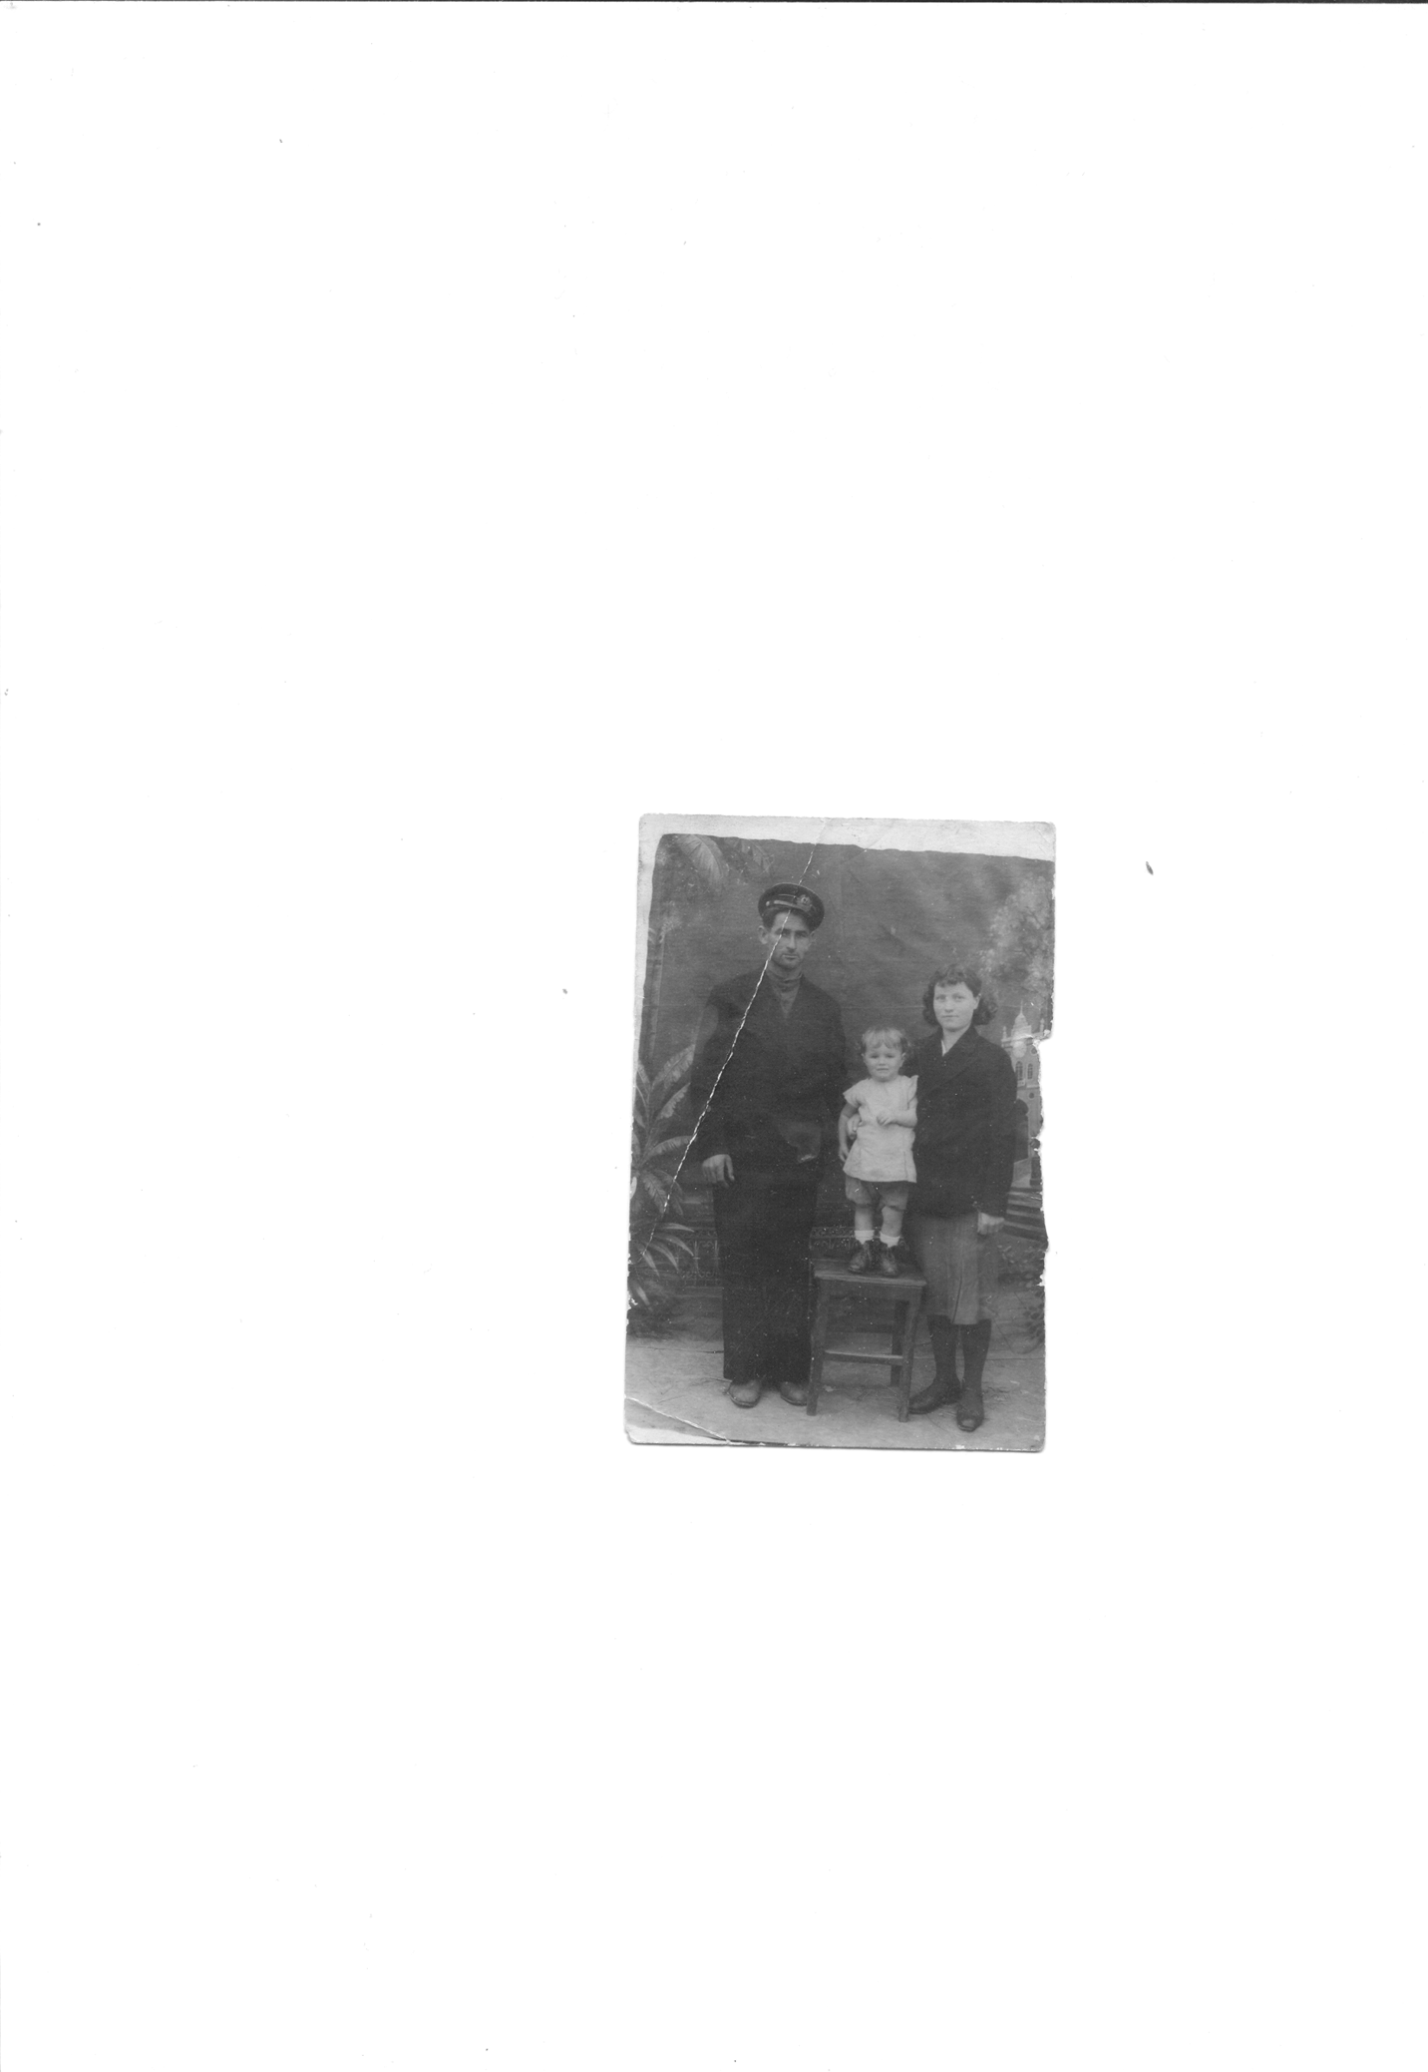 C:\Documents and Settings\Валентина Григорьевн\Мои документы\Семья нир\фото нип семья н0007.tif